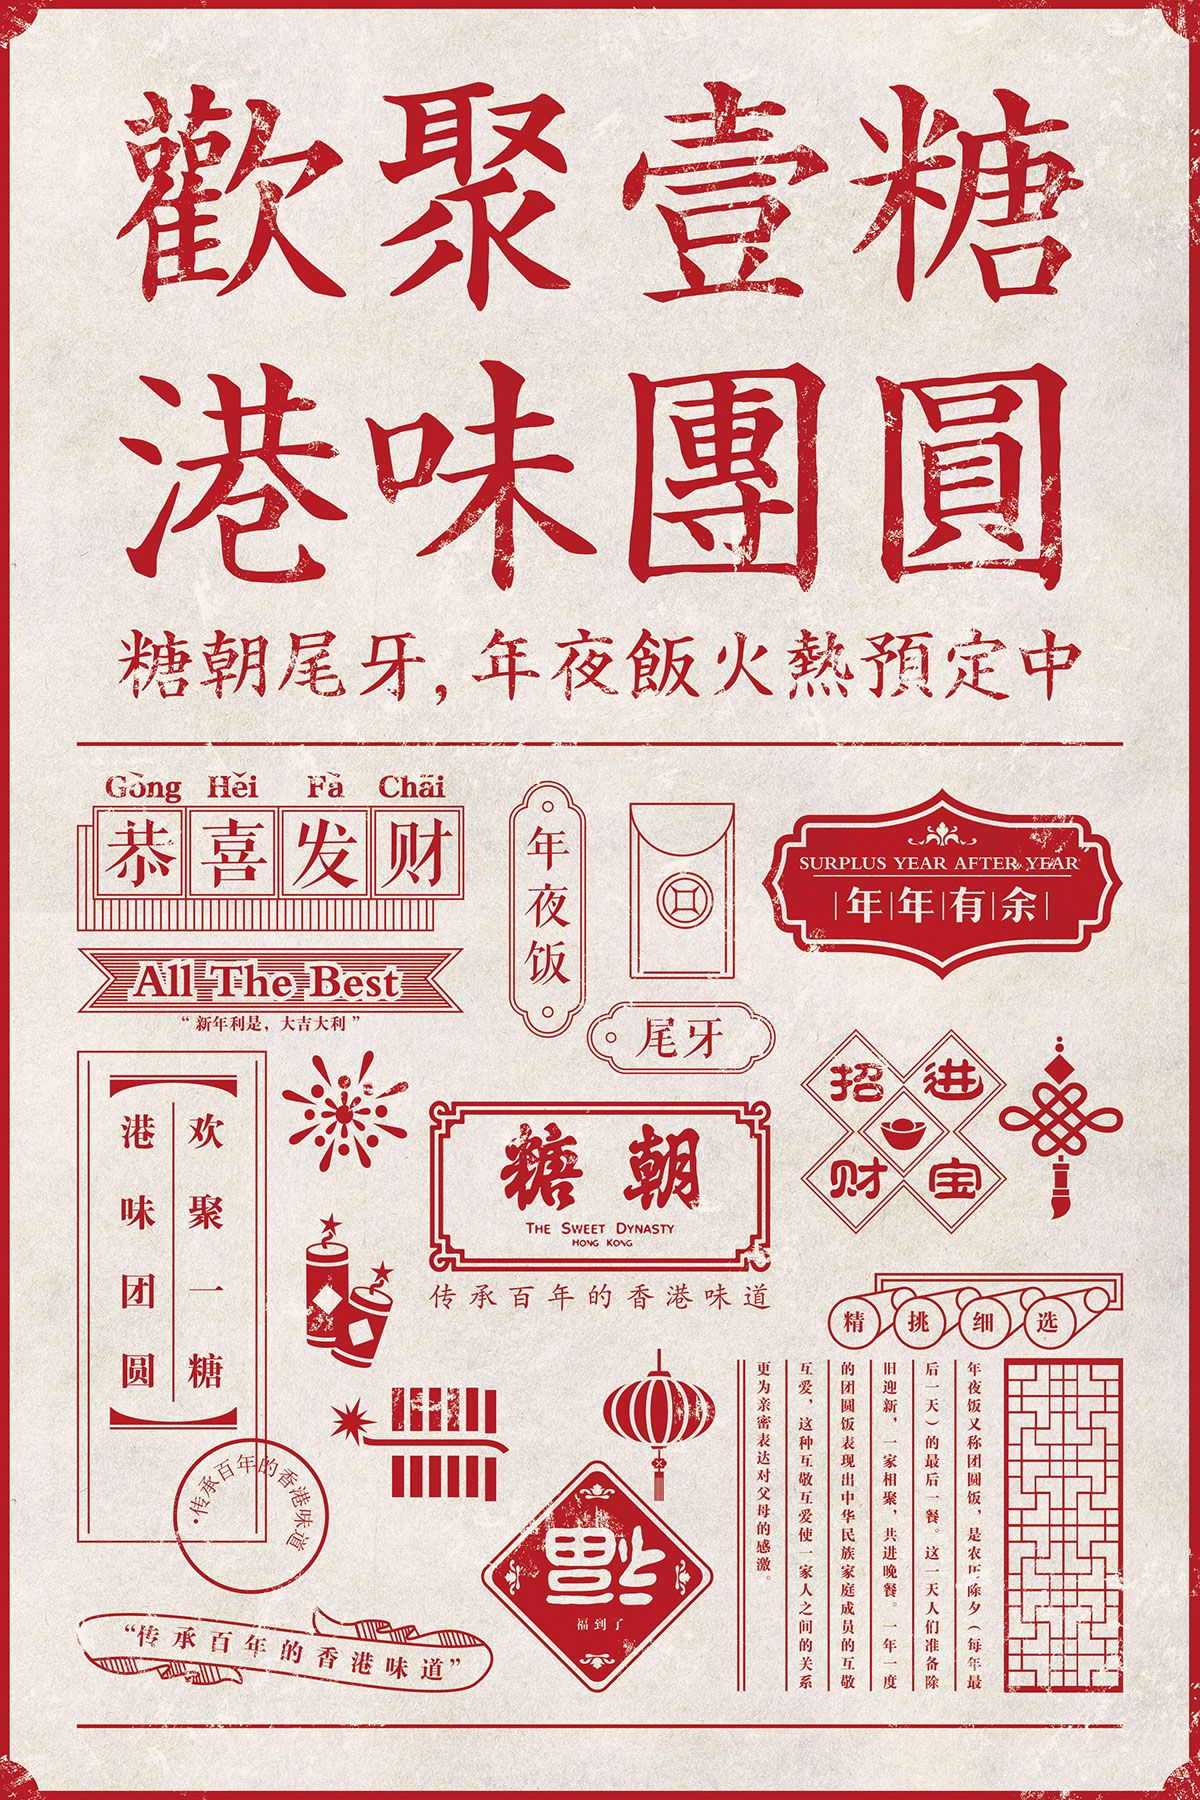 Photo of Sugar chaos restaurant new year poster